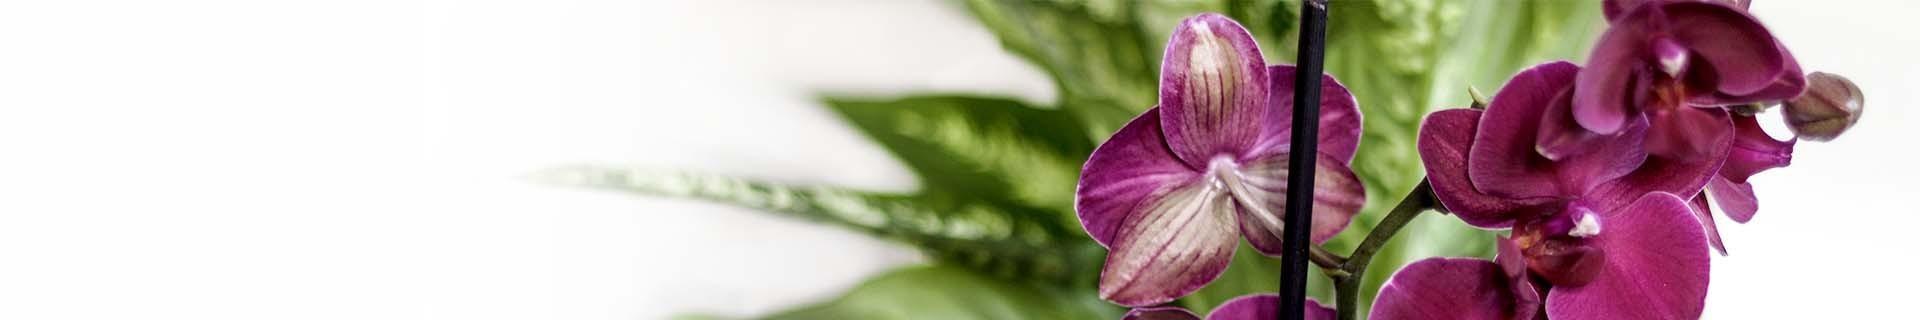 Plantes pel jardí vertical d'interior Citysens.